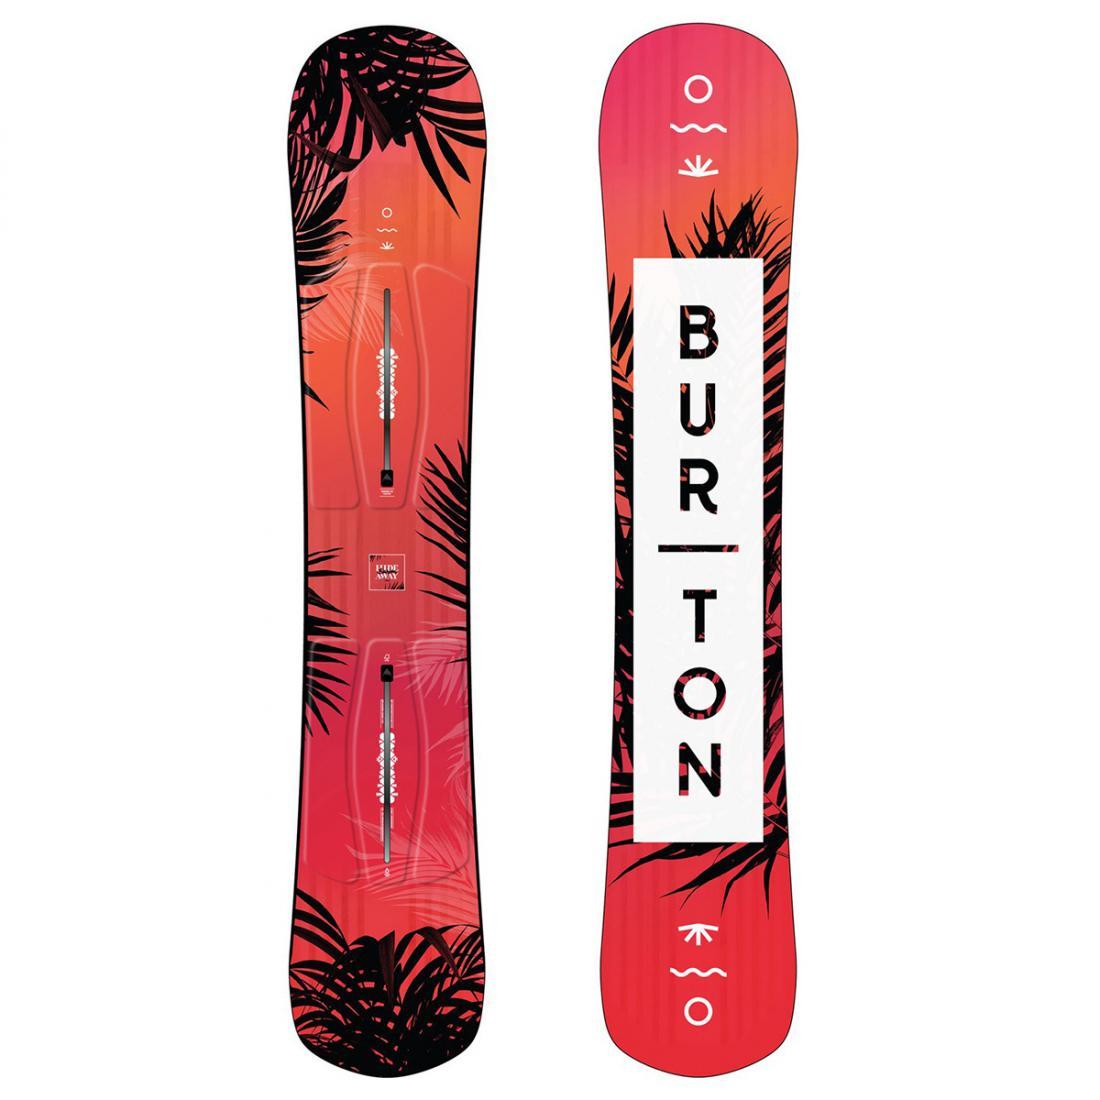 Сноуборд Burton Hideaway купить в Boardshop №1